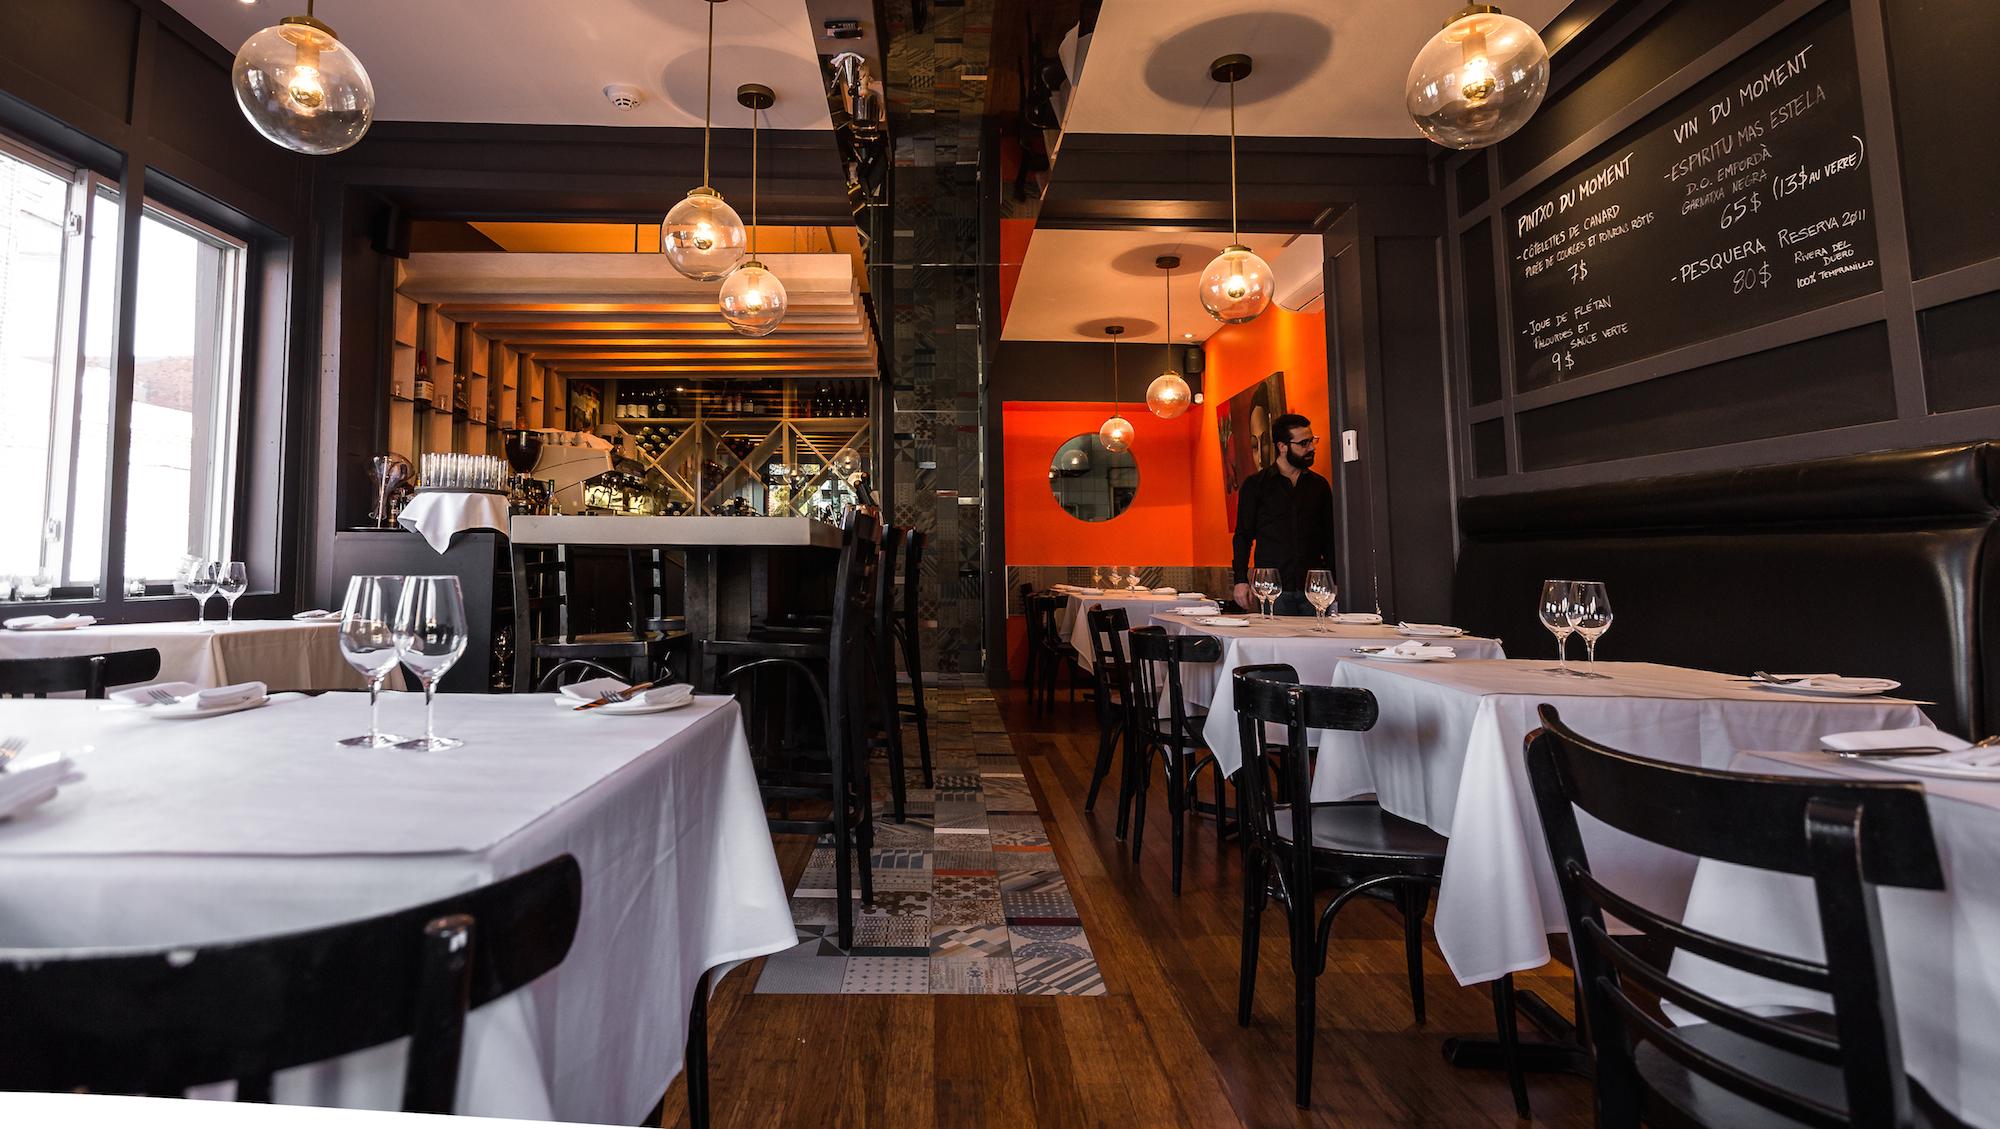 Miami On The Cheap >> Step Inside Pintxo, Plateau Montreal's Reborn Spanish ...